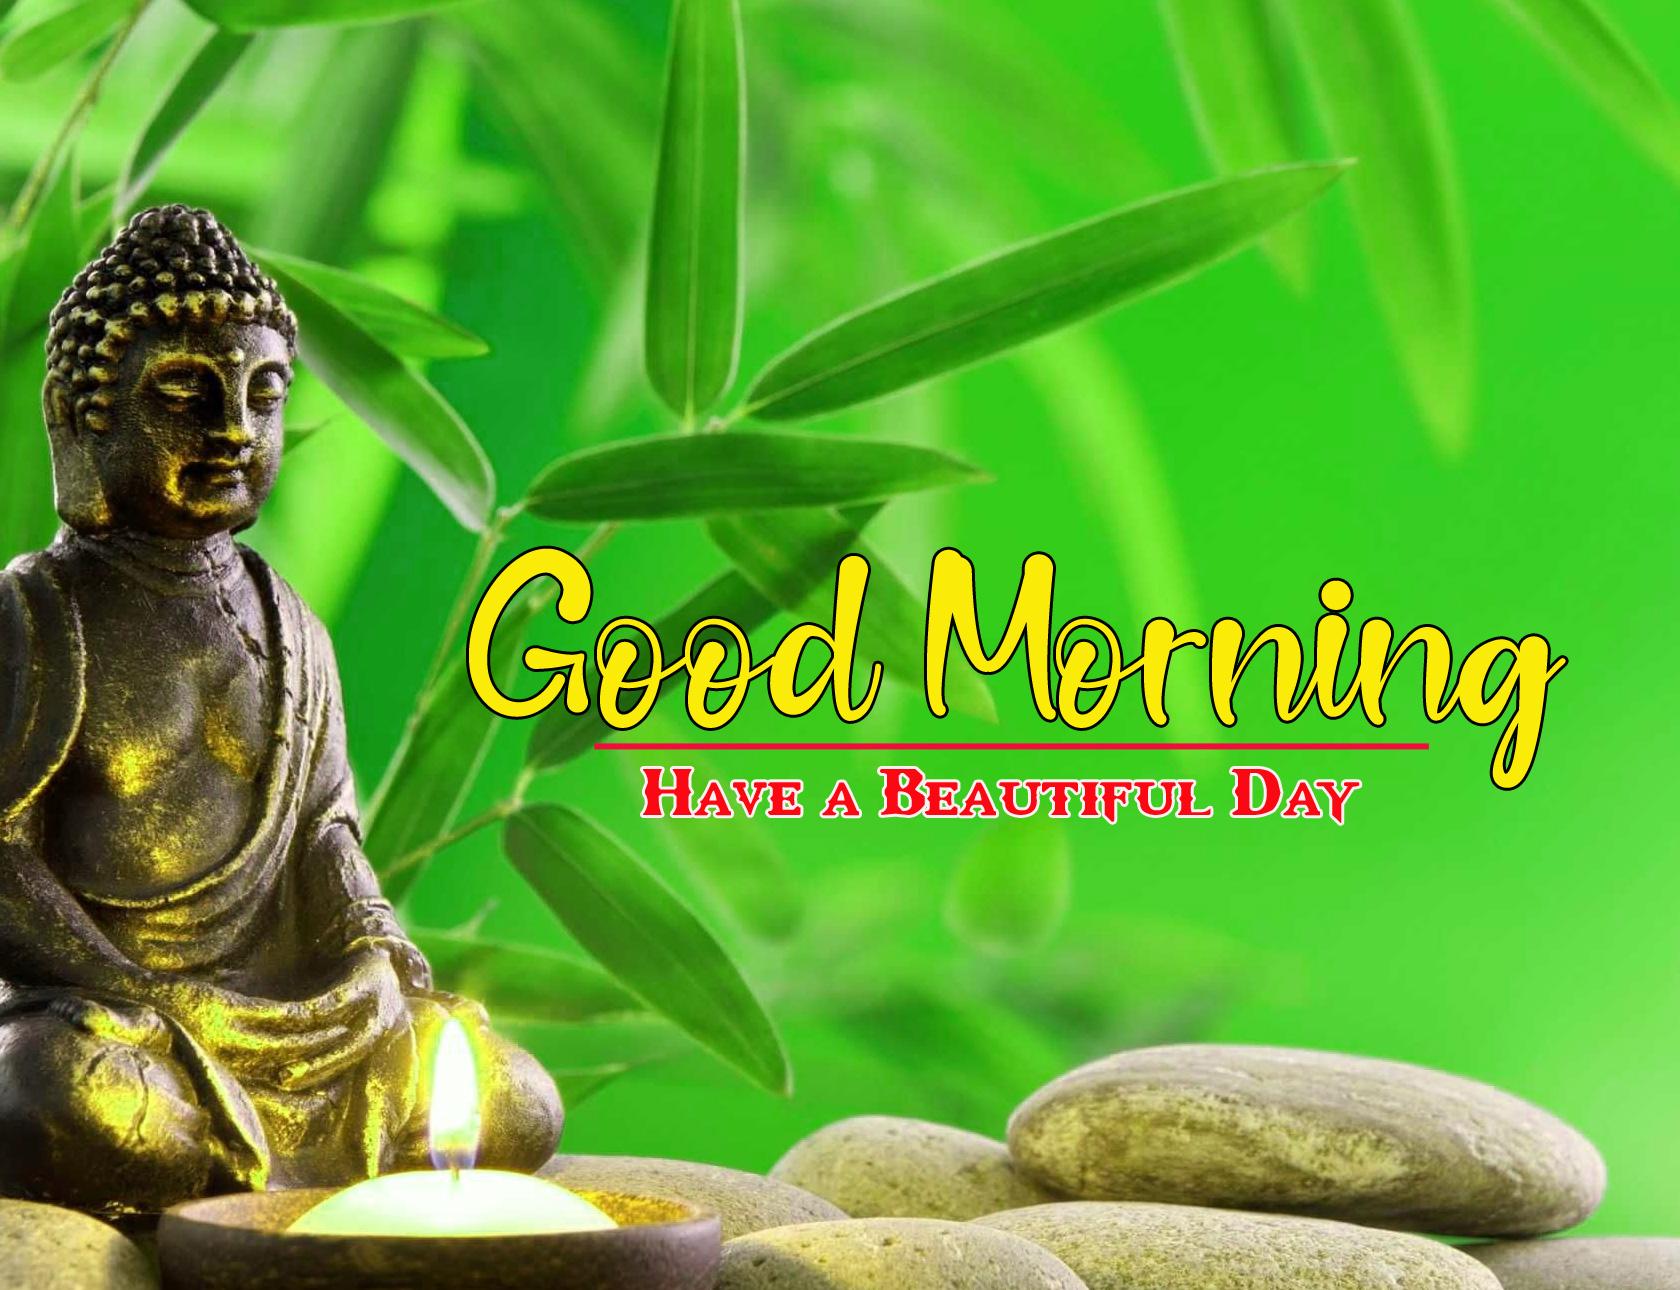 Buddha Good Morning Images Pics Free Download free